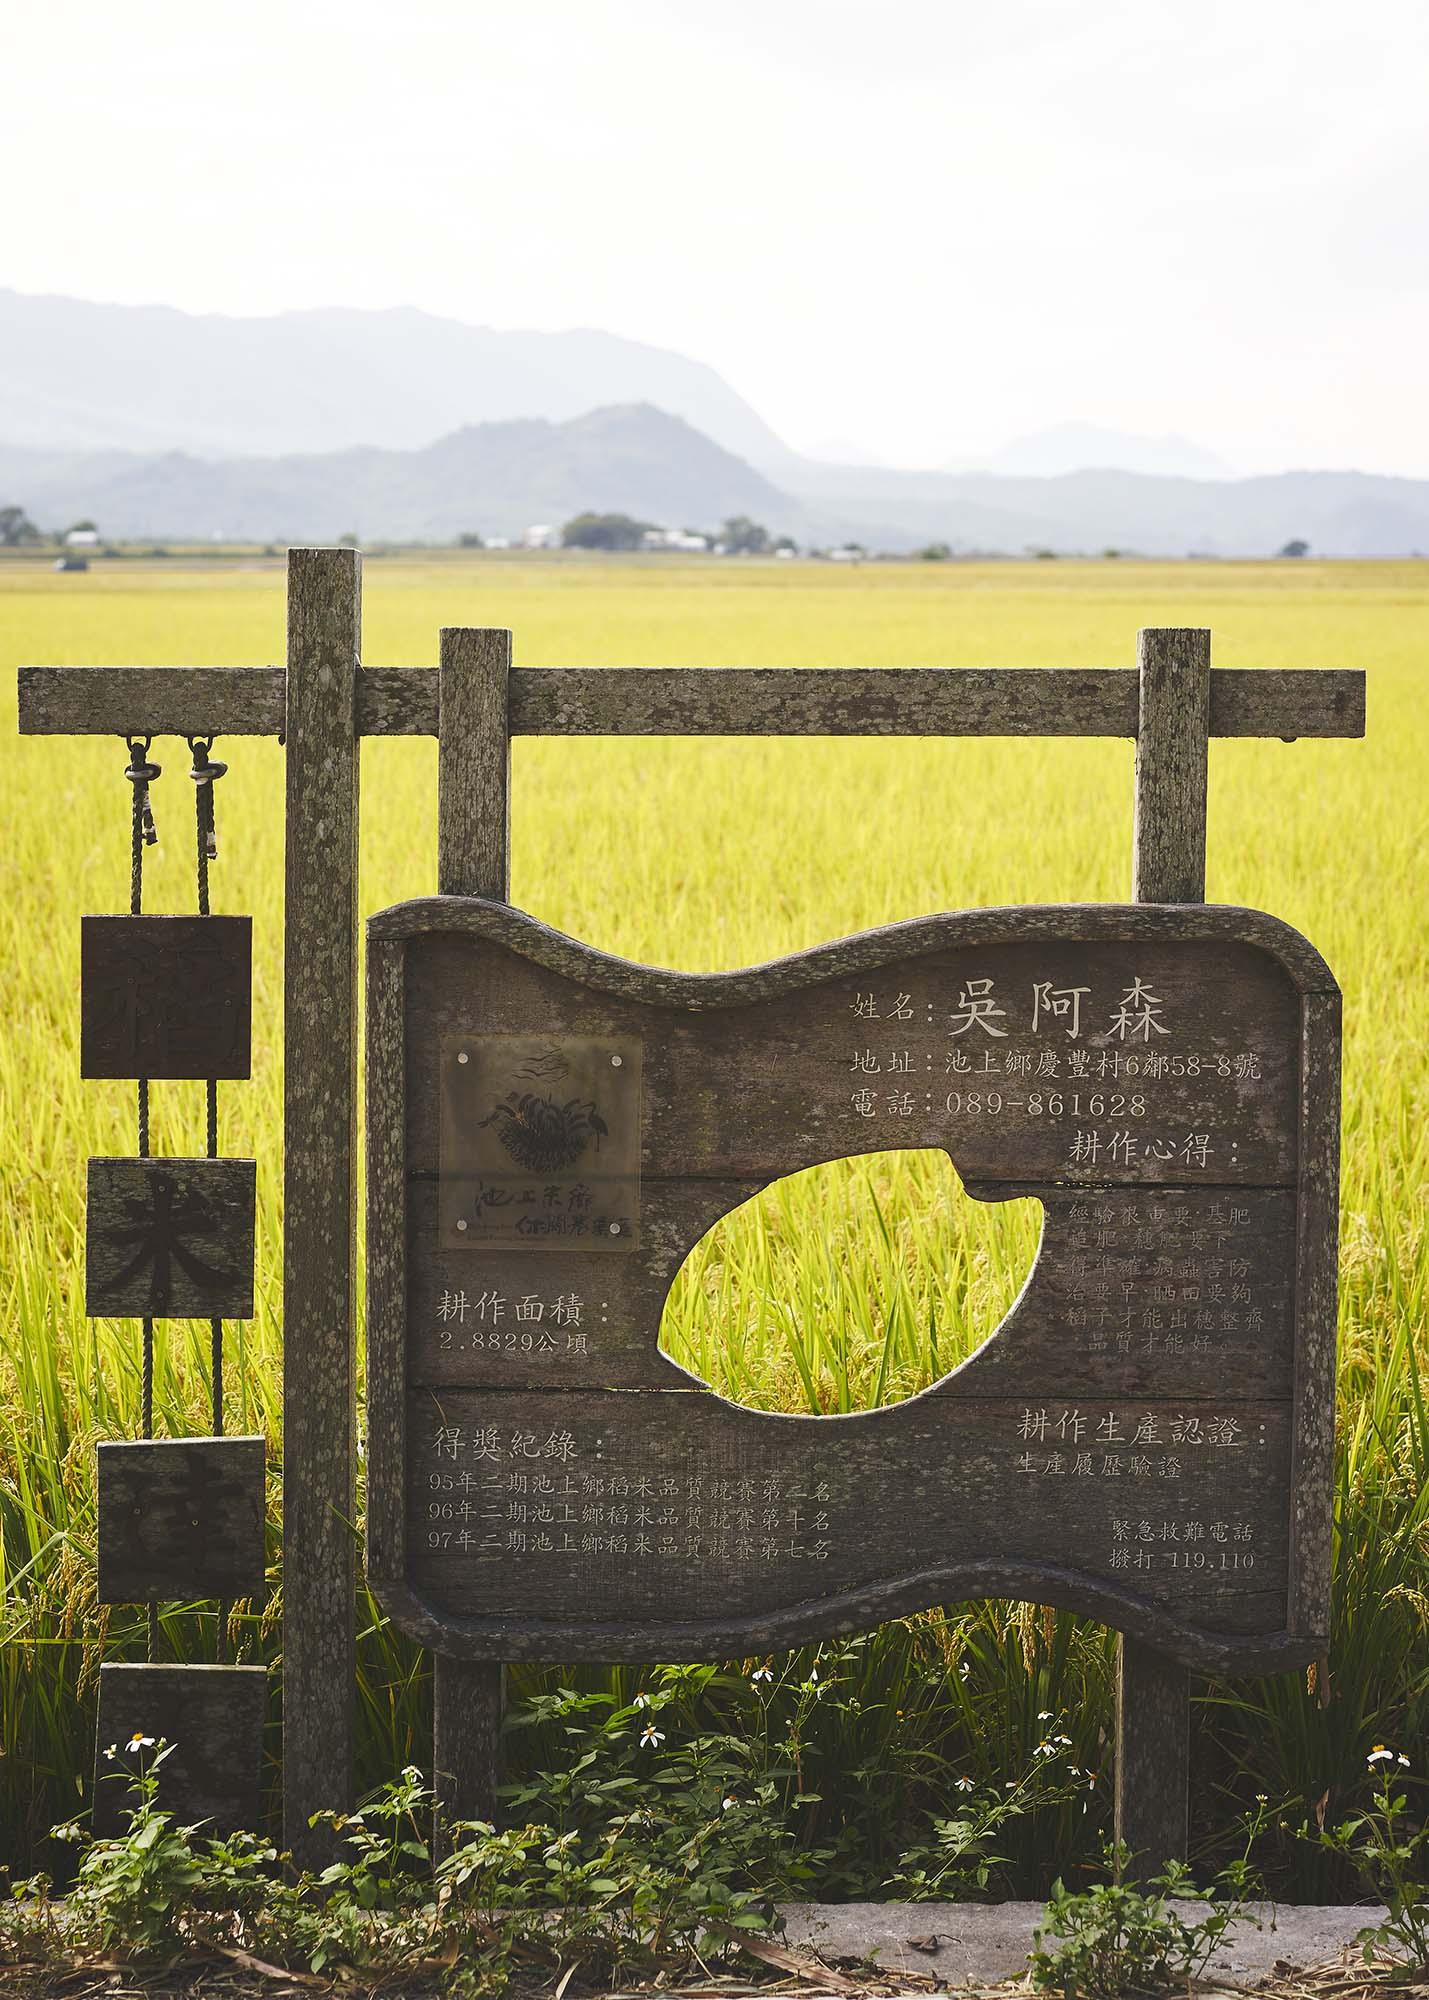 1711120 Taiwan 01320.jpg